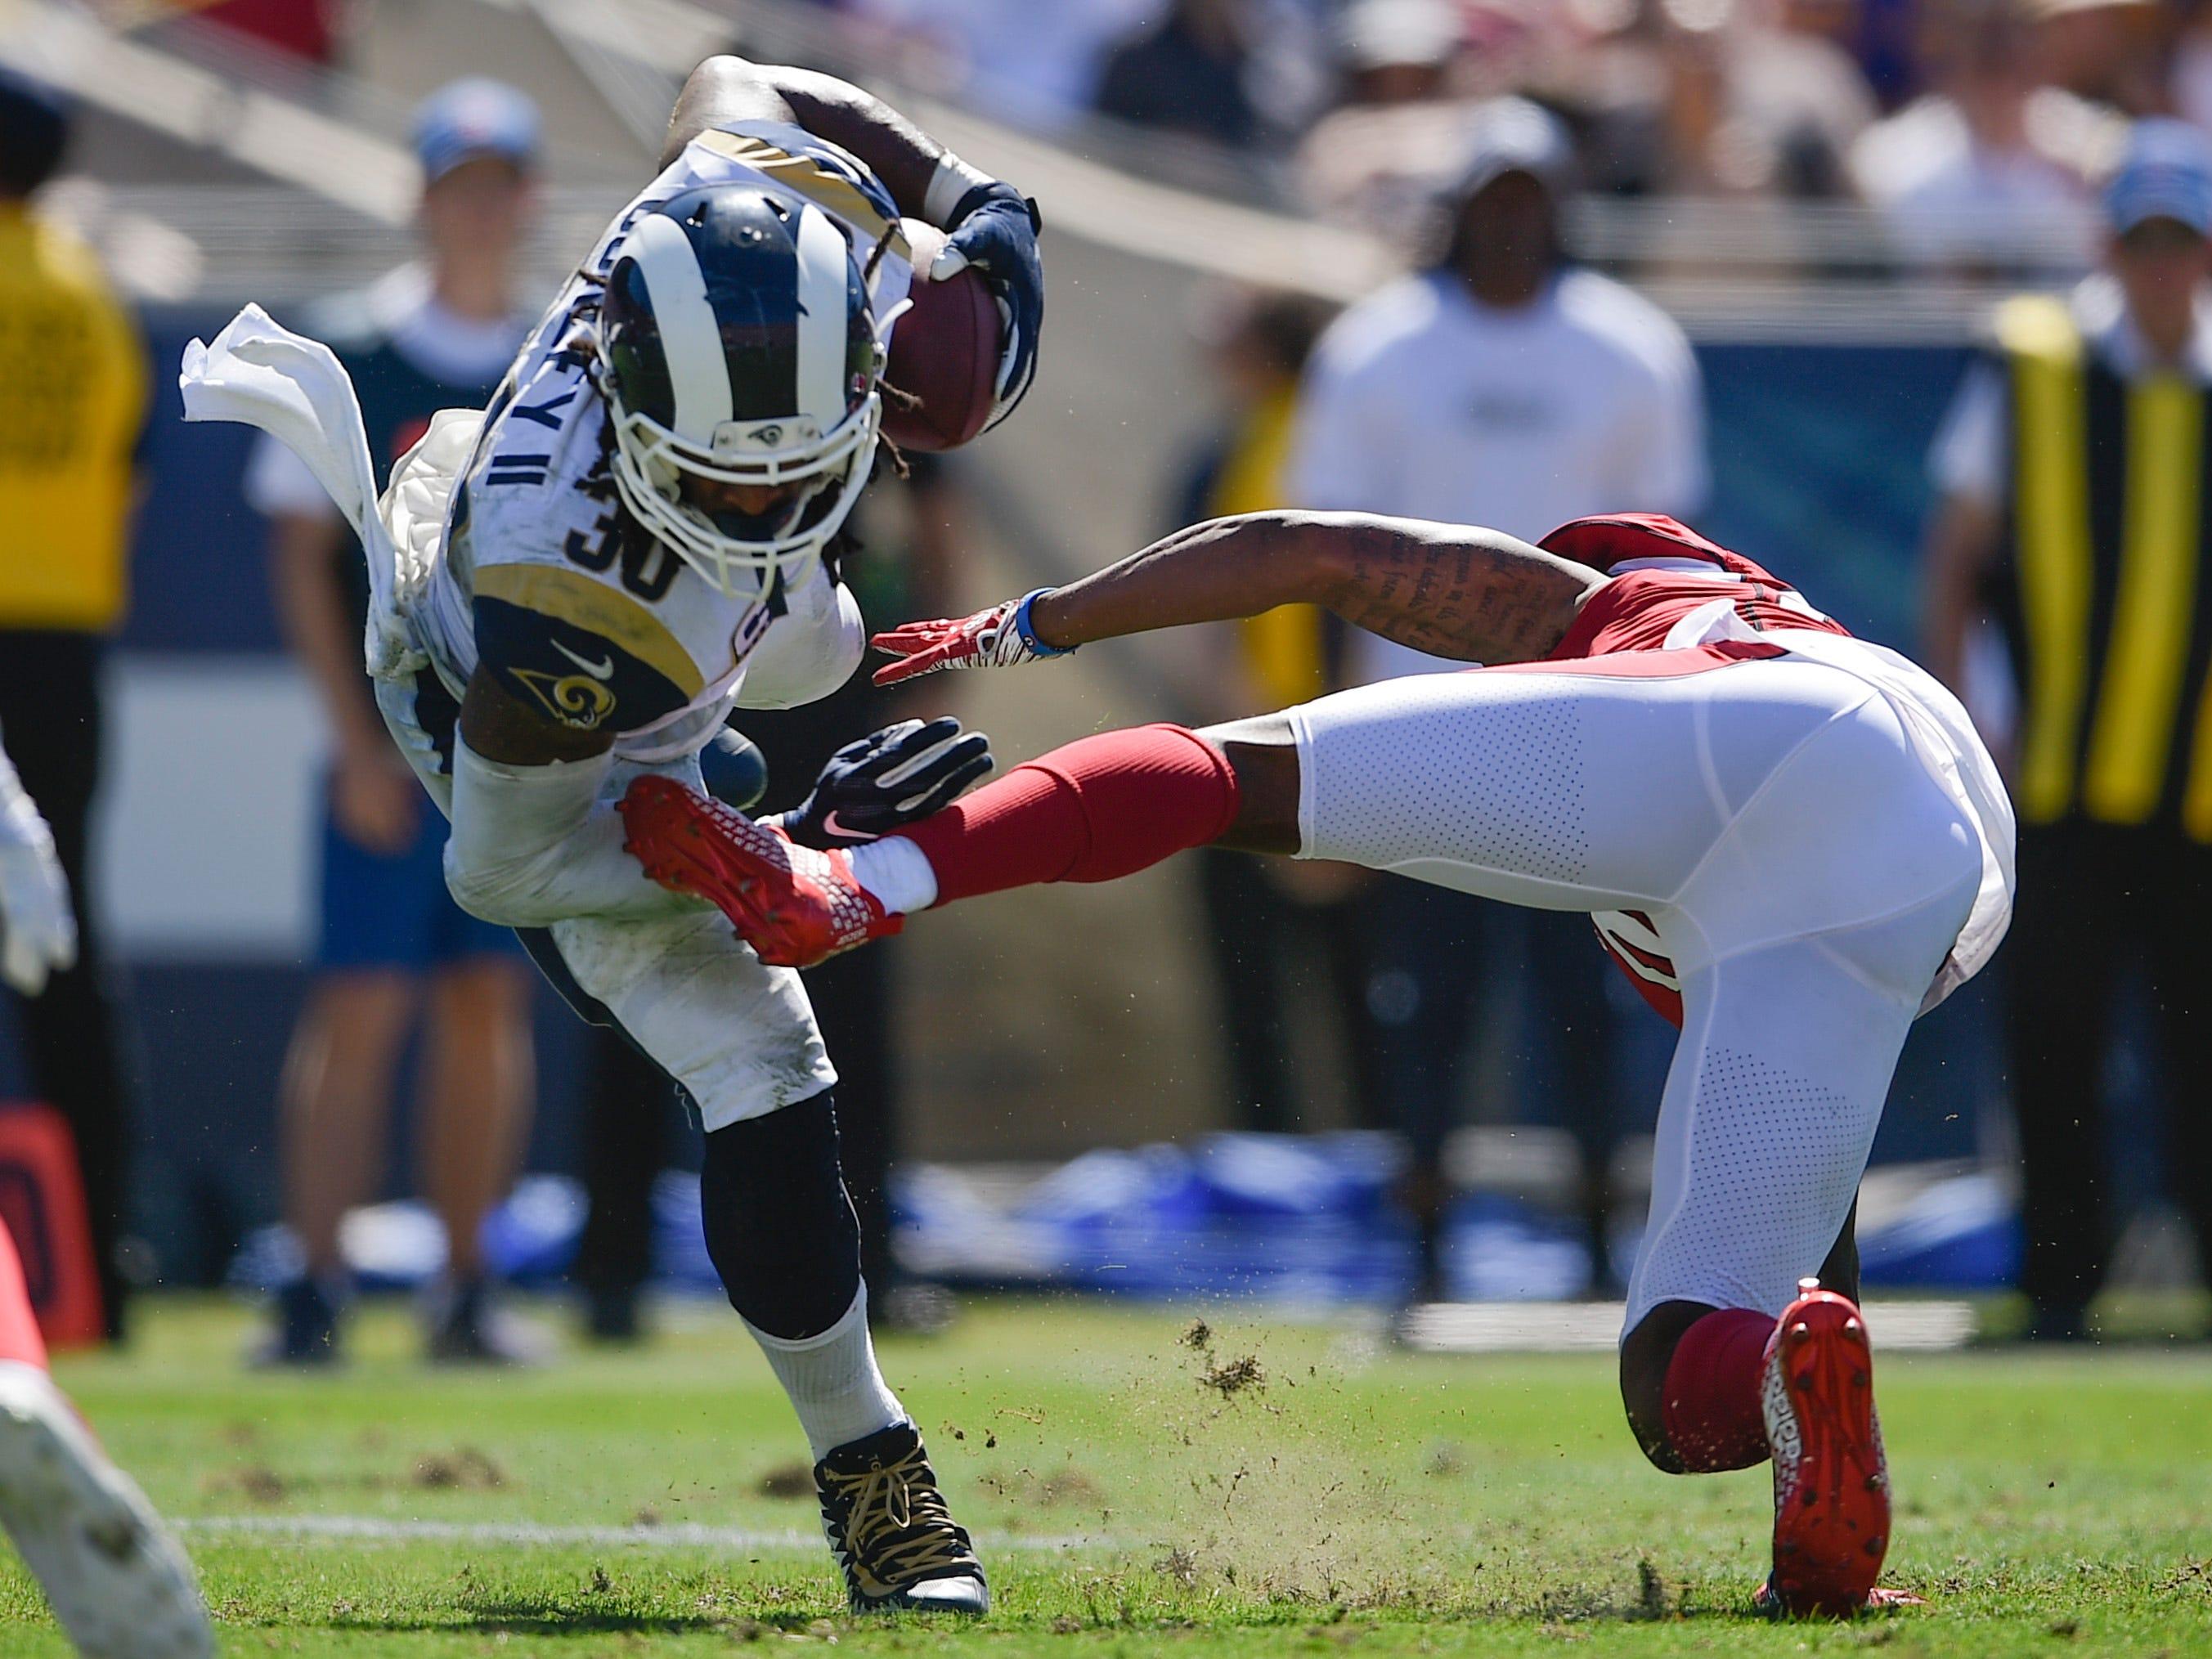 Sep 16, 2018; Los Angeles, CA, USA; Arizona Cardinals cornerback Bene Benwikere (23) tackles Los Angeles Rams running back Todd Gurley II (30) during the first half at Los Angeles Memorial Coliseum. Mandatory Credit: Kelvin Kuo-USA TODAY Sports